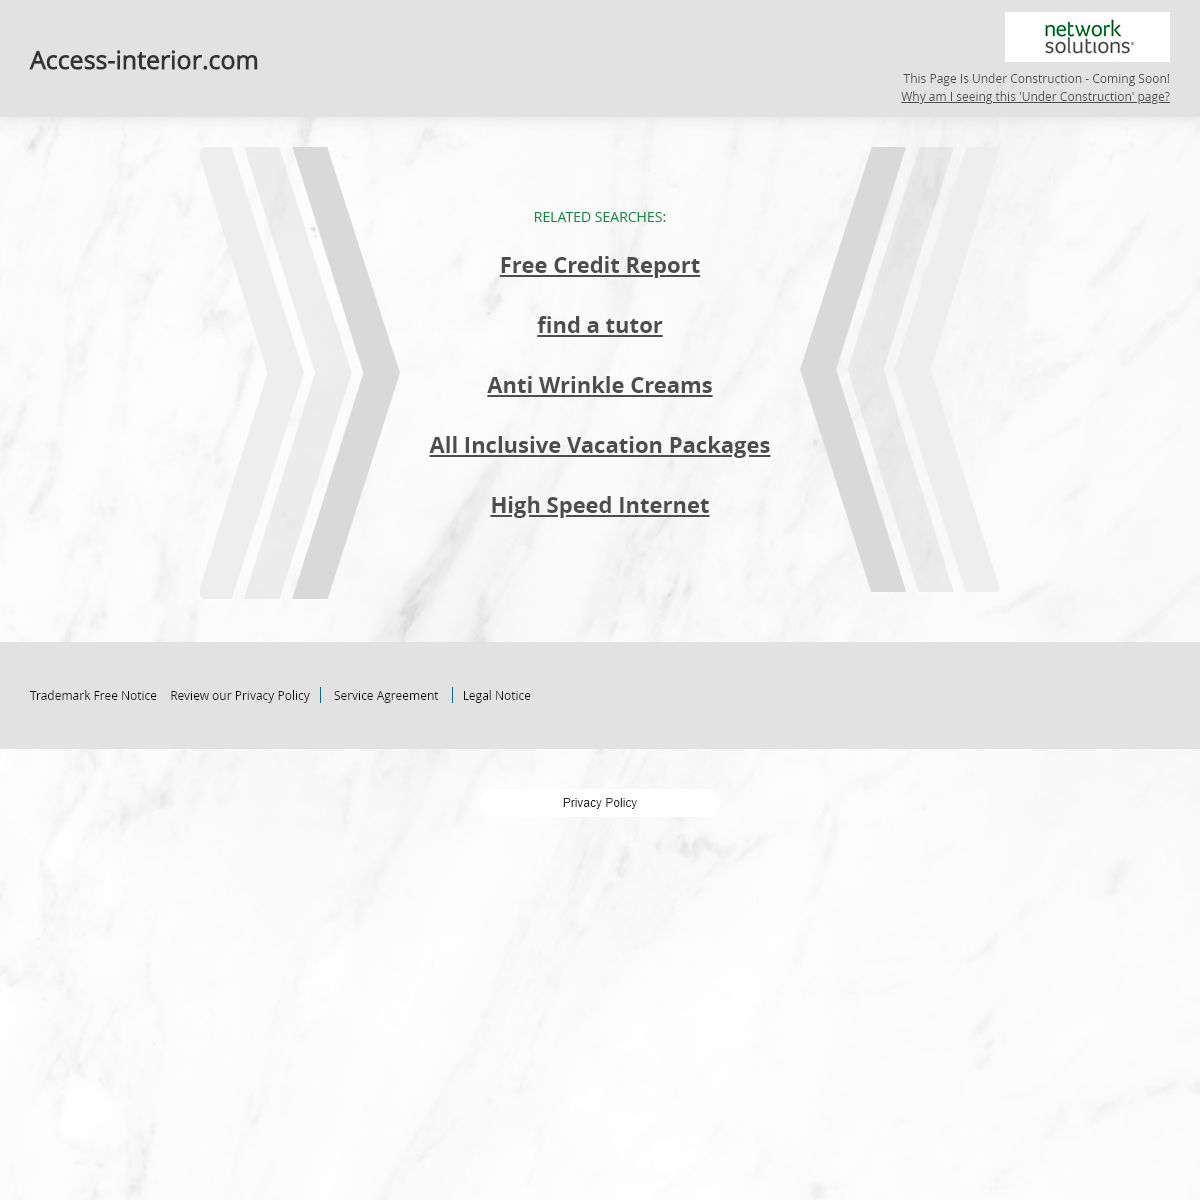 Access-interior.com